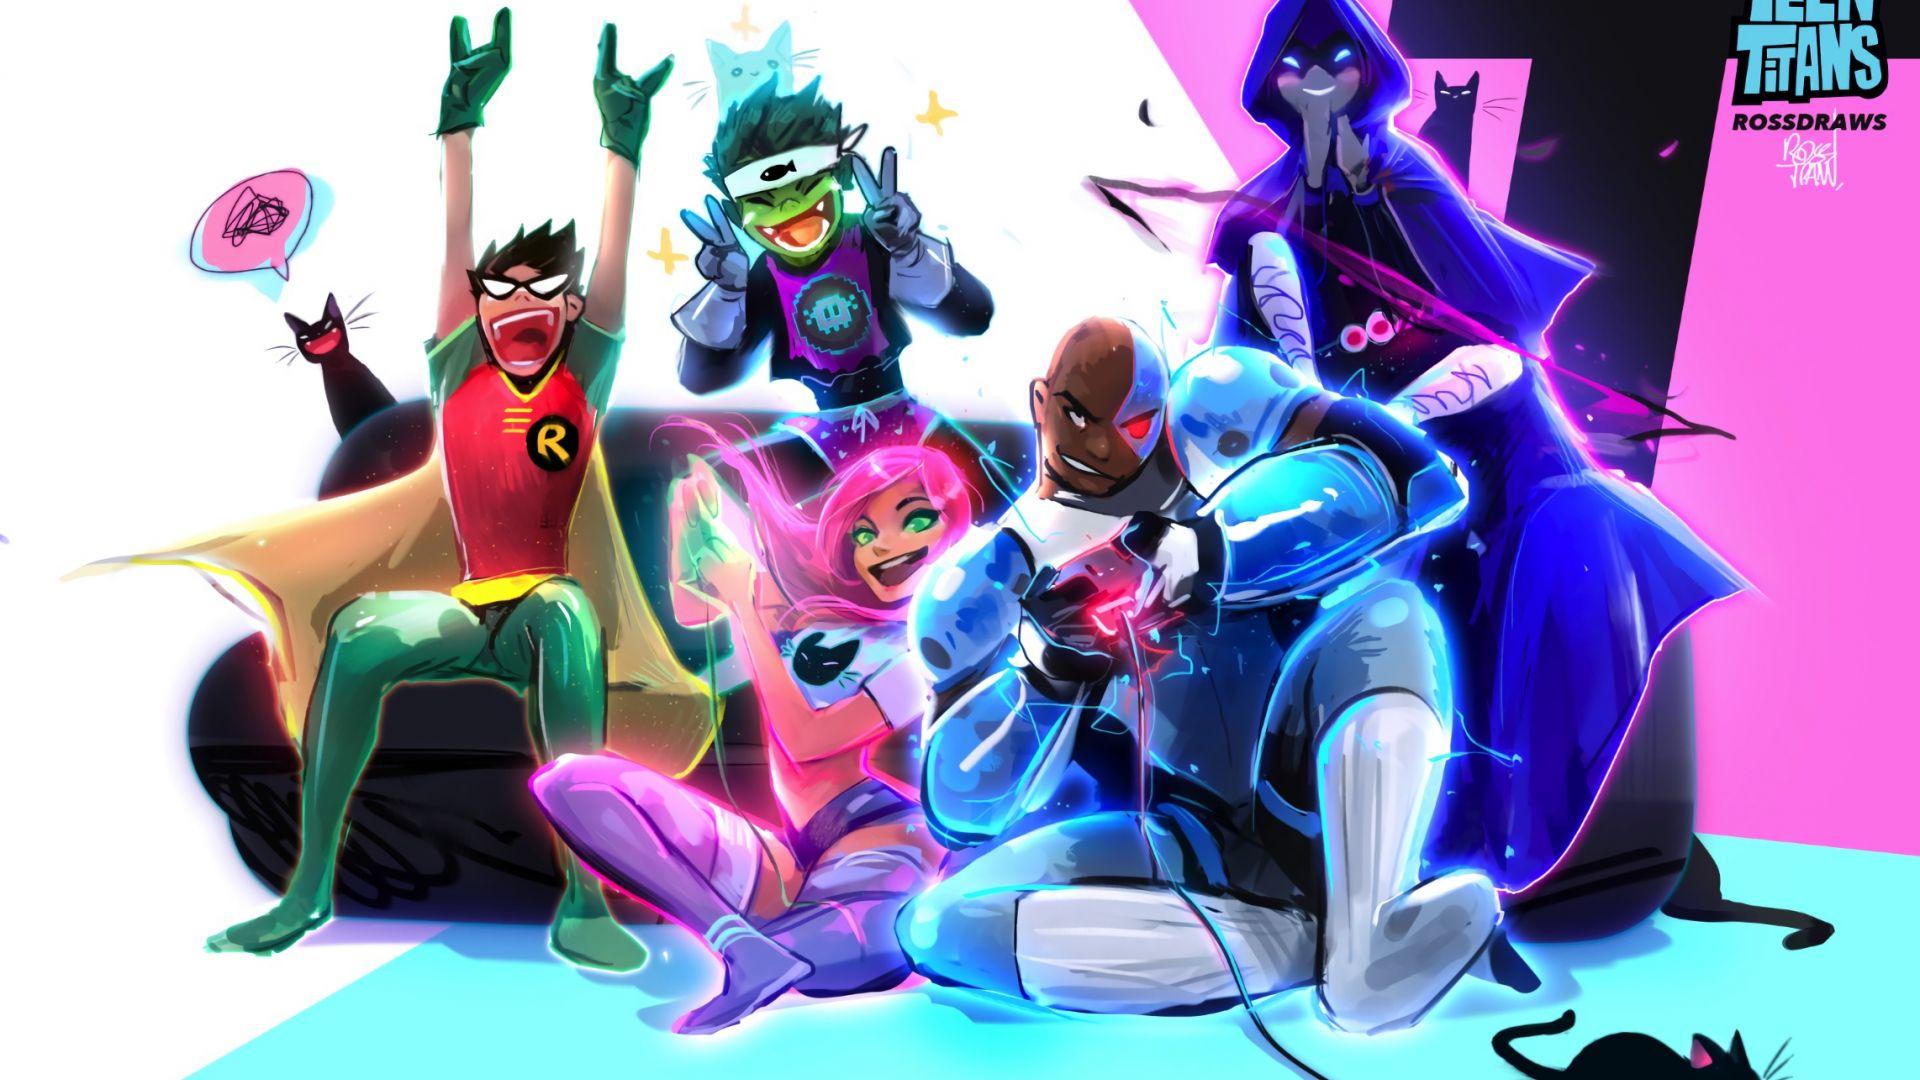 Desktop Wallpaper Teen Titans, Tv Series, Cartoon, Superhero, Robin, Cyborg, Play, Art -8061